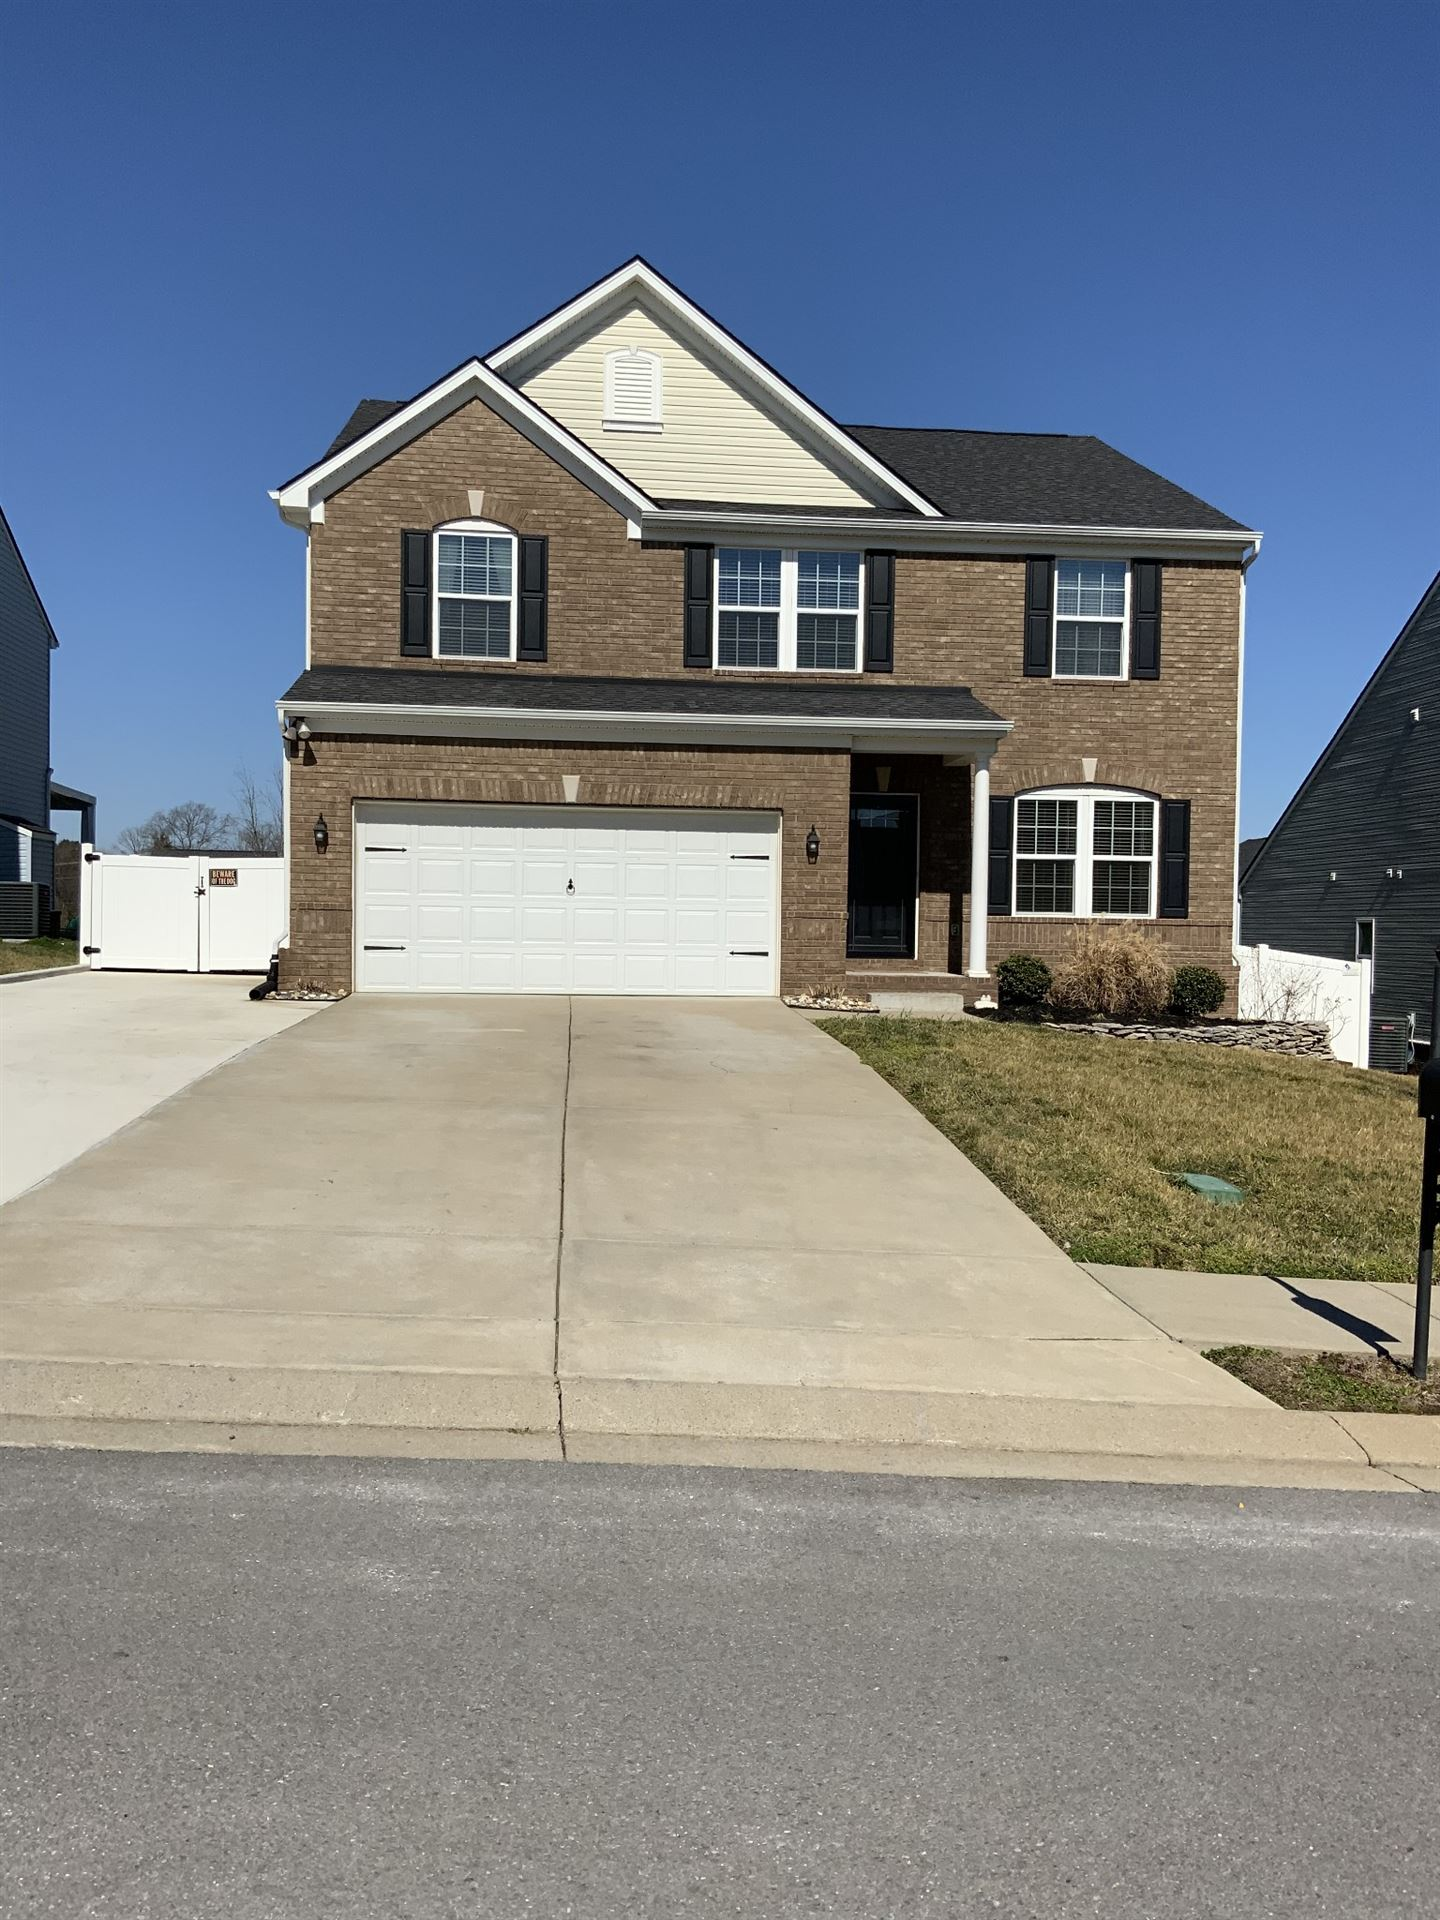 2211 Ambergate Dr, Murfreesboro, TN 37127 - MLS#: 2231245